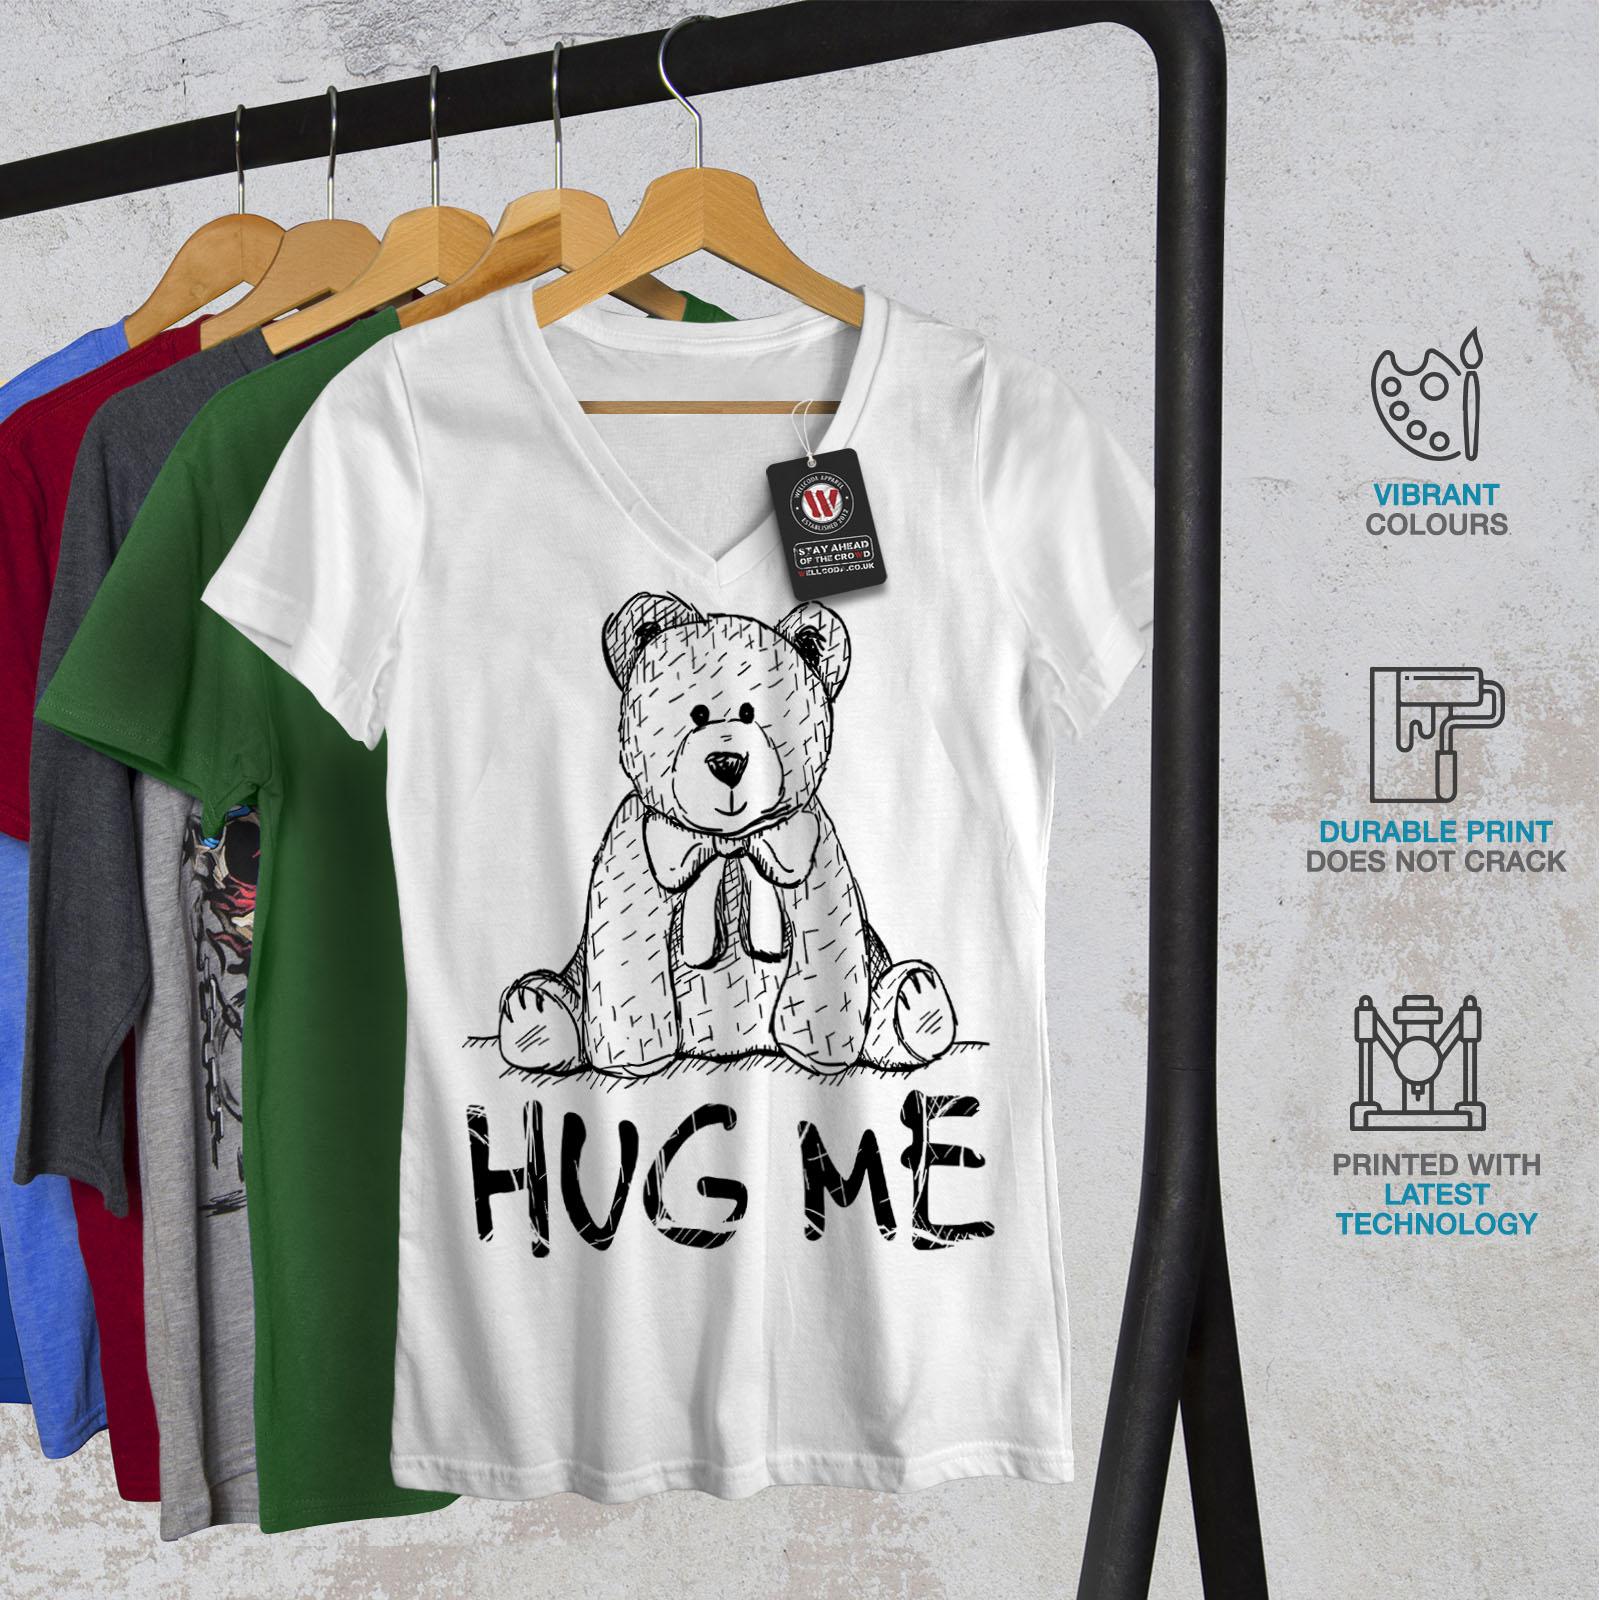 miniature 8 - Wellcoda Hug Me Teddy Bear Womens V-Neck T-shirt, Nice & Graphic Design Tee